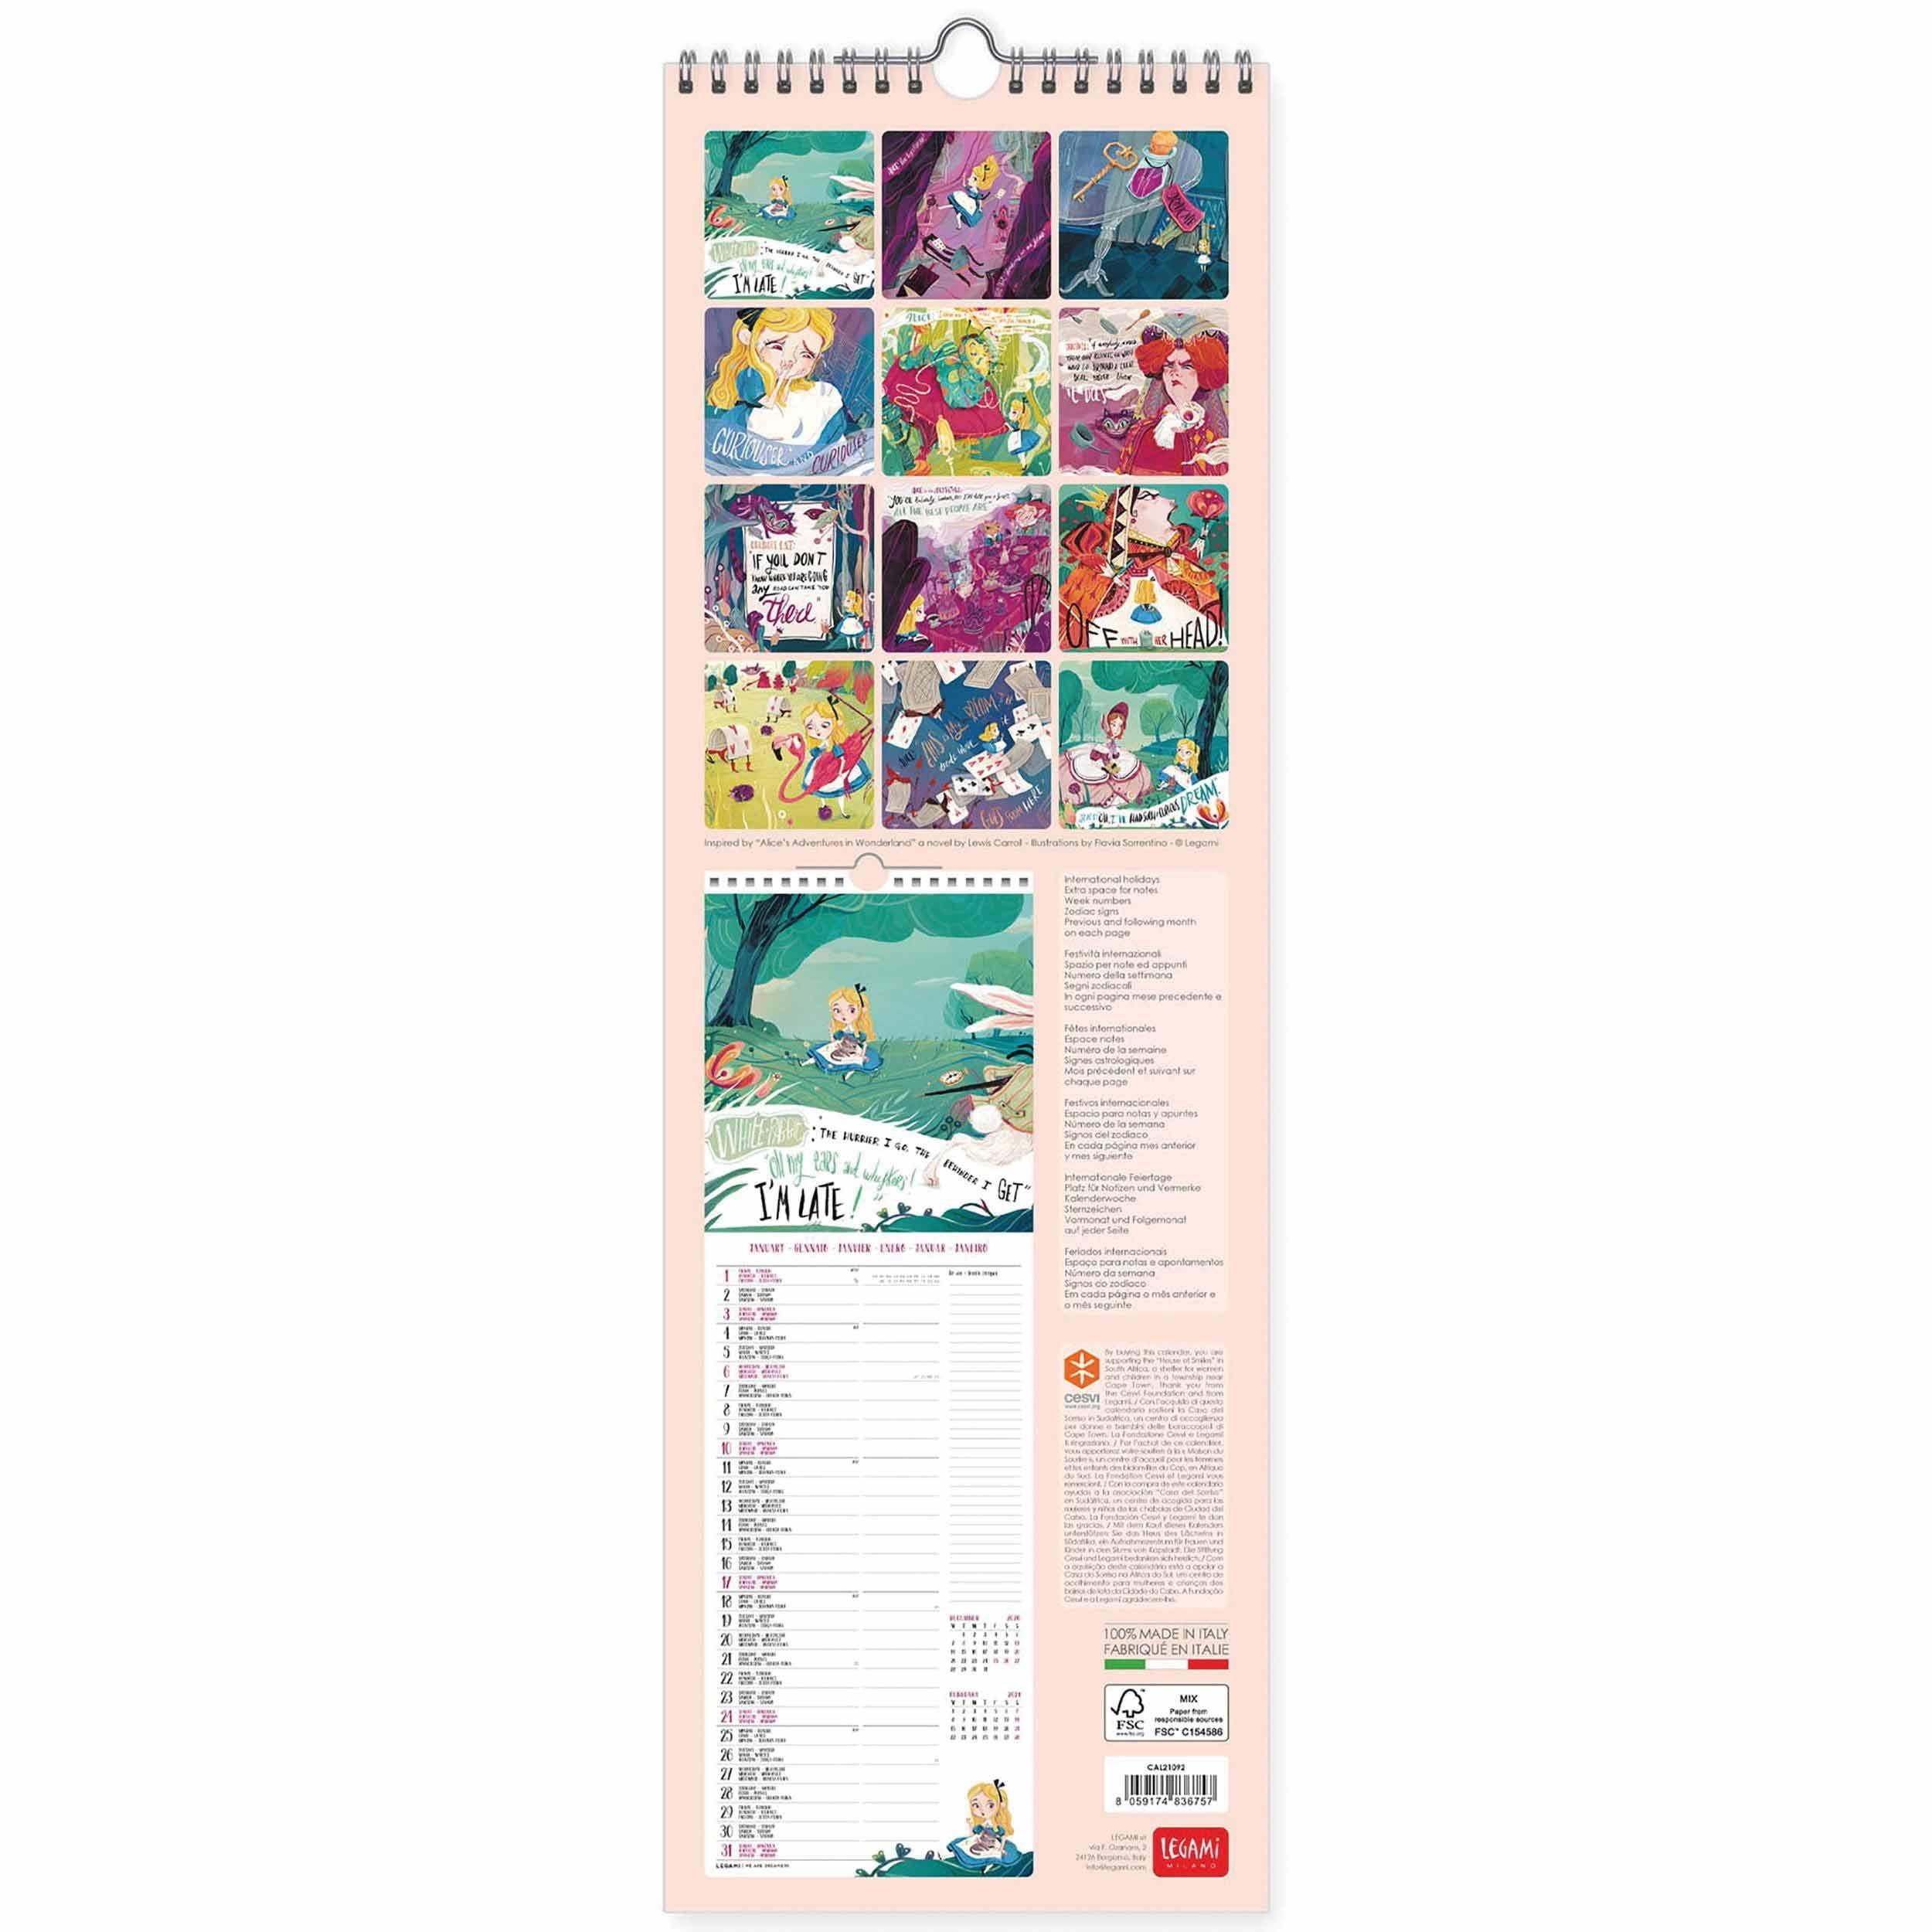 Lewis Carroll, Alice In Wonderland Deluxe Slim Calendar 2021 At Calendar  Club